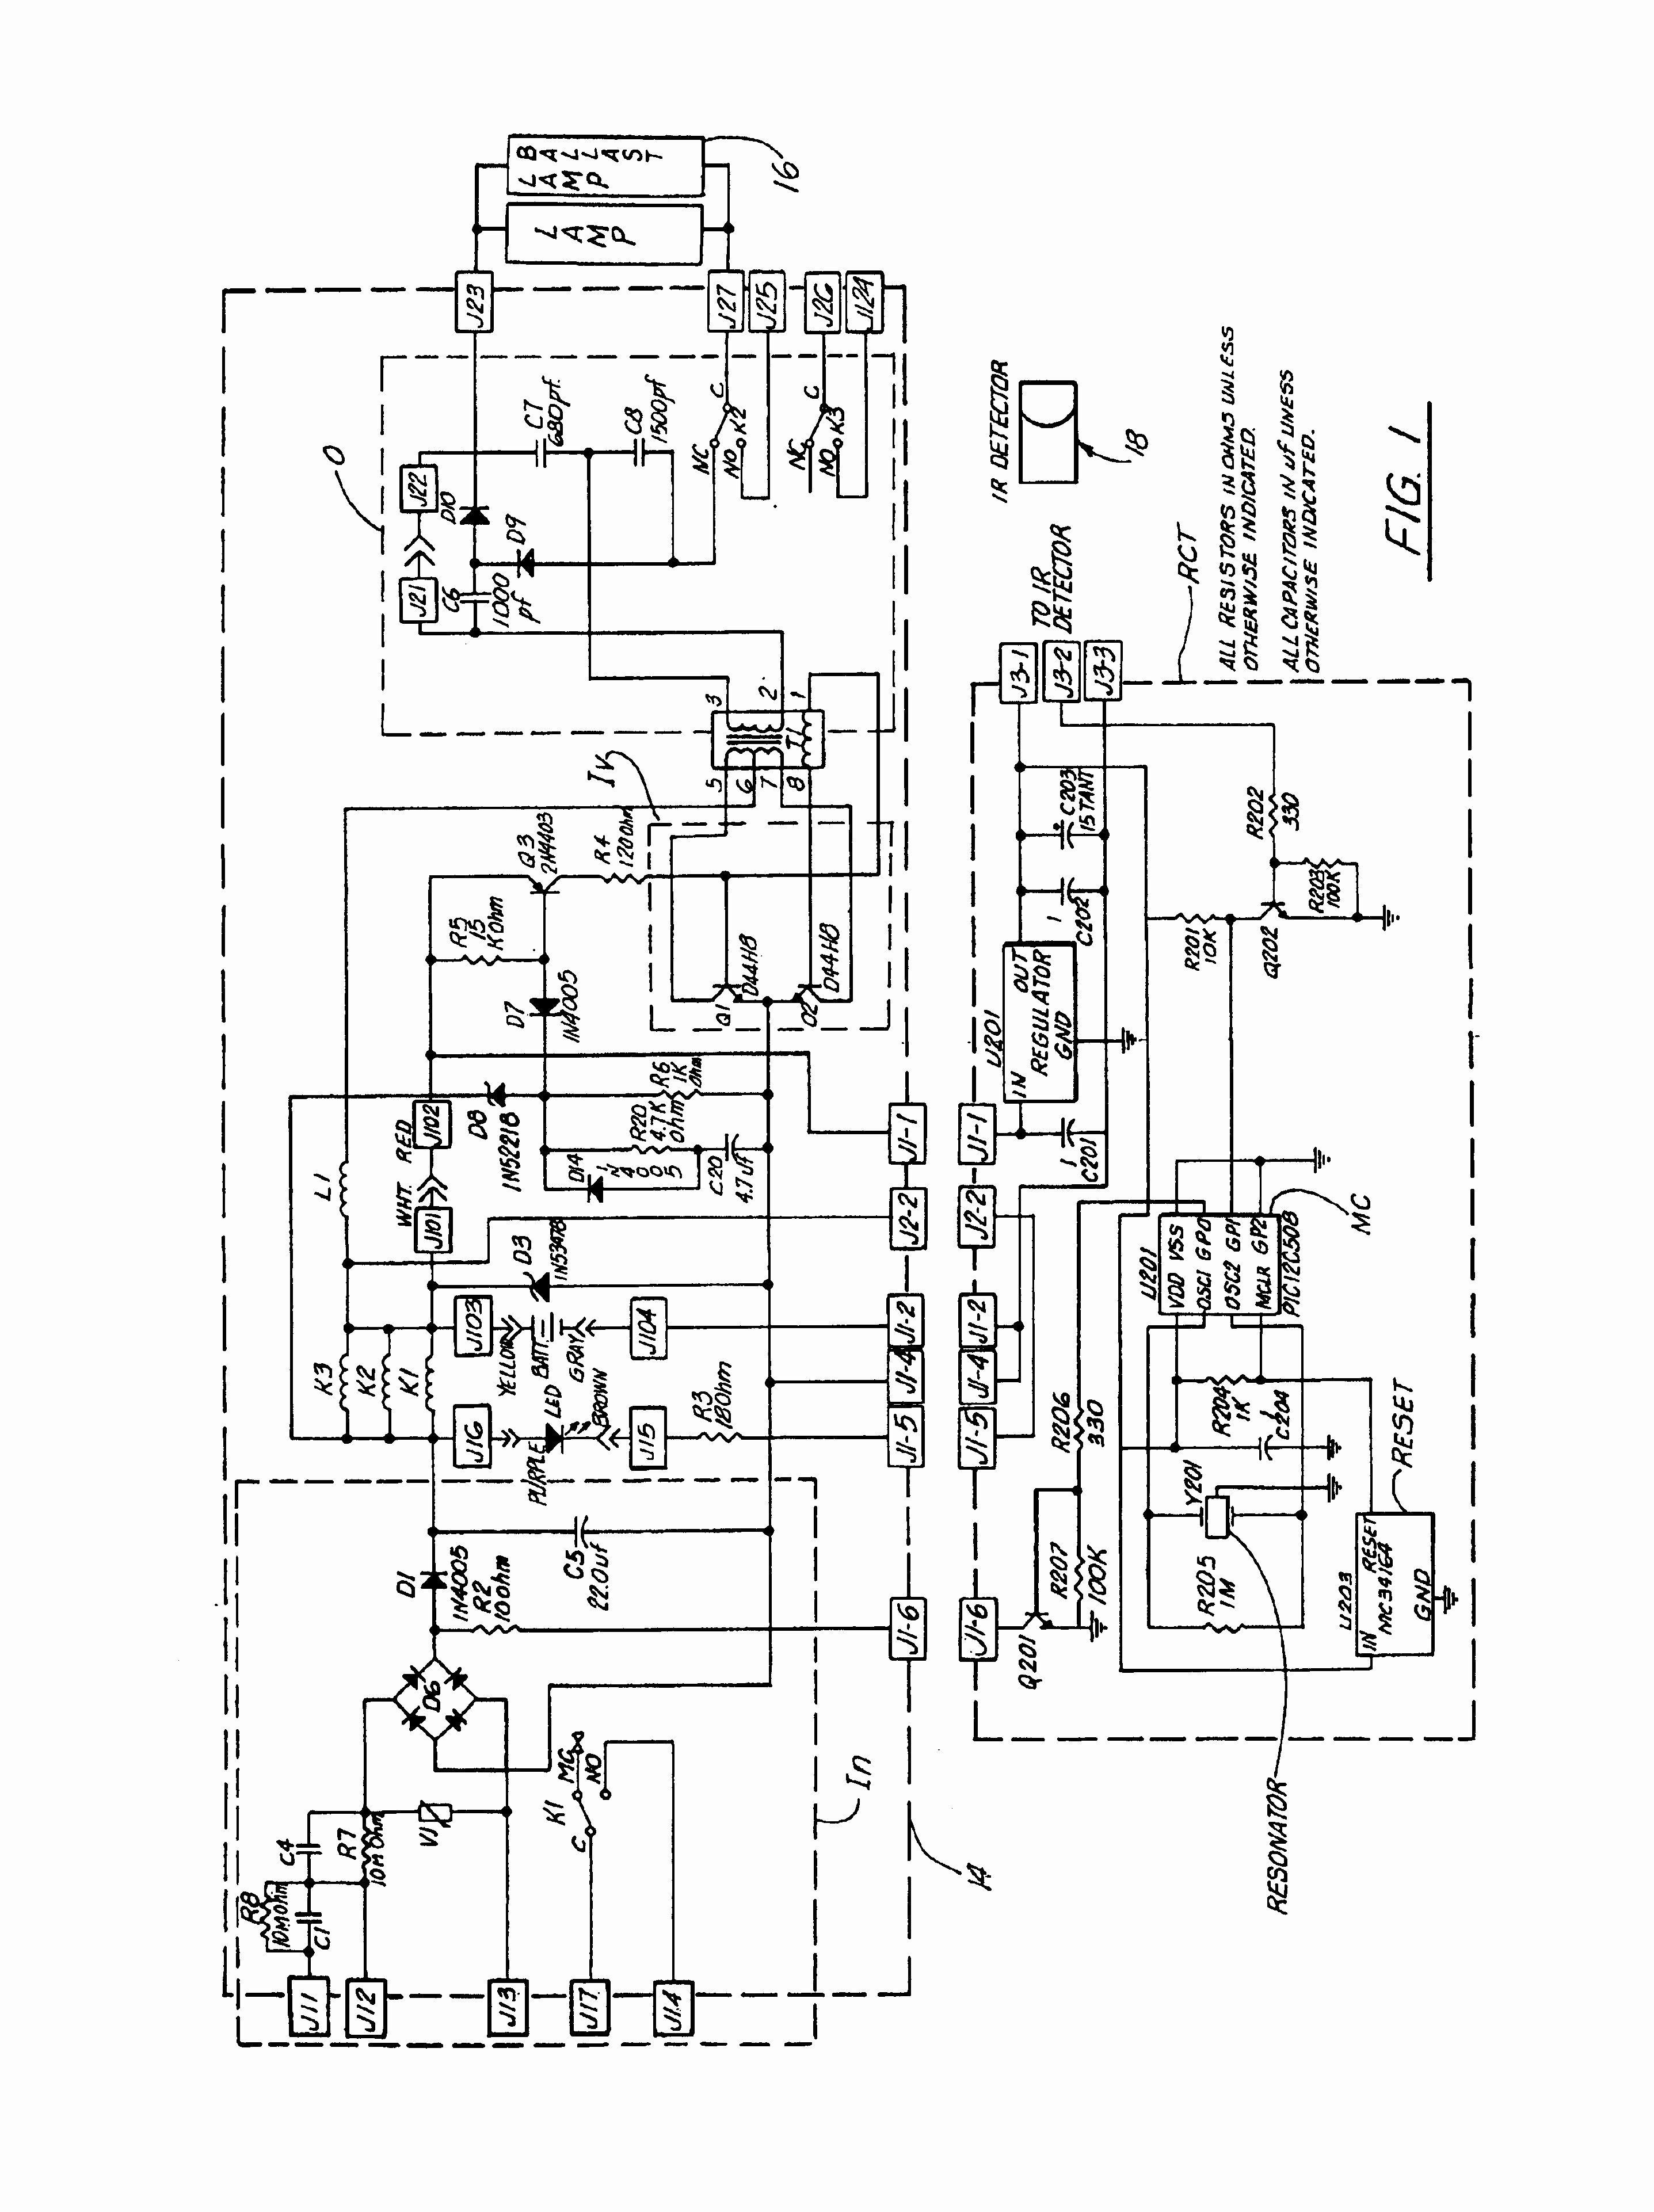 Philips Advance Ballast Wiring Diagram Recent 2 Lamp T8